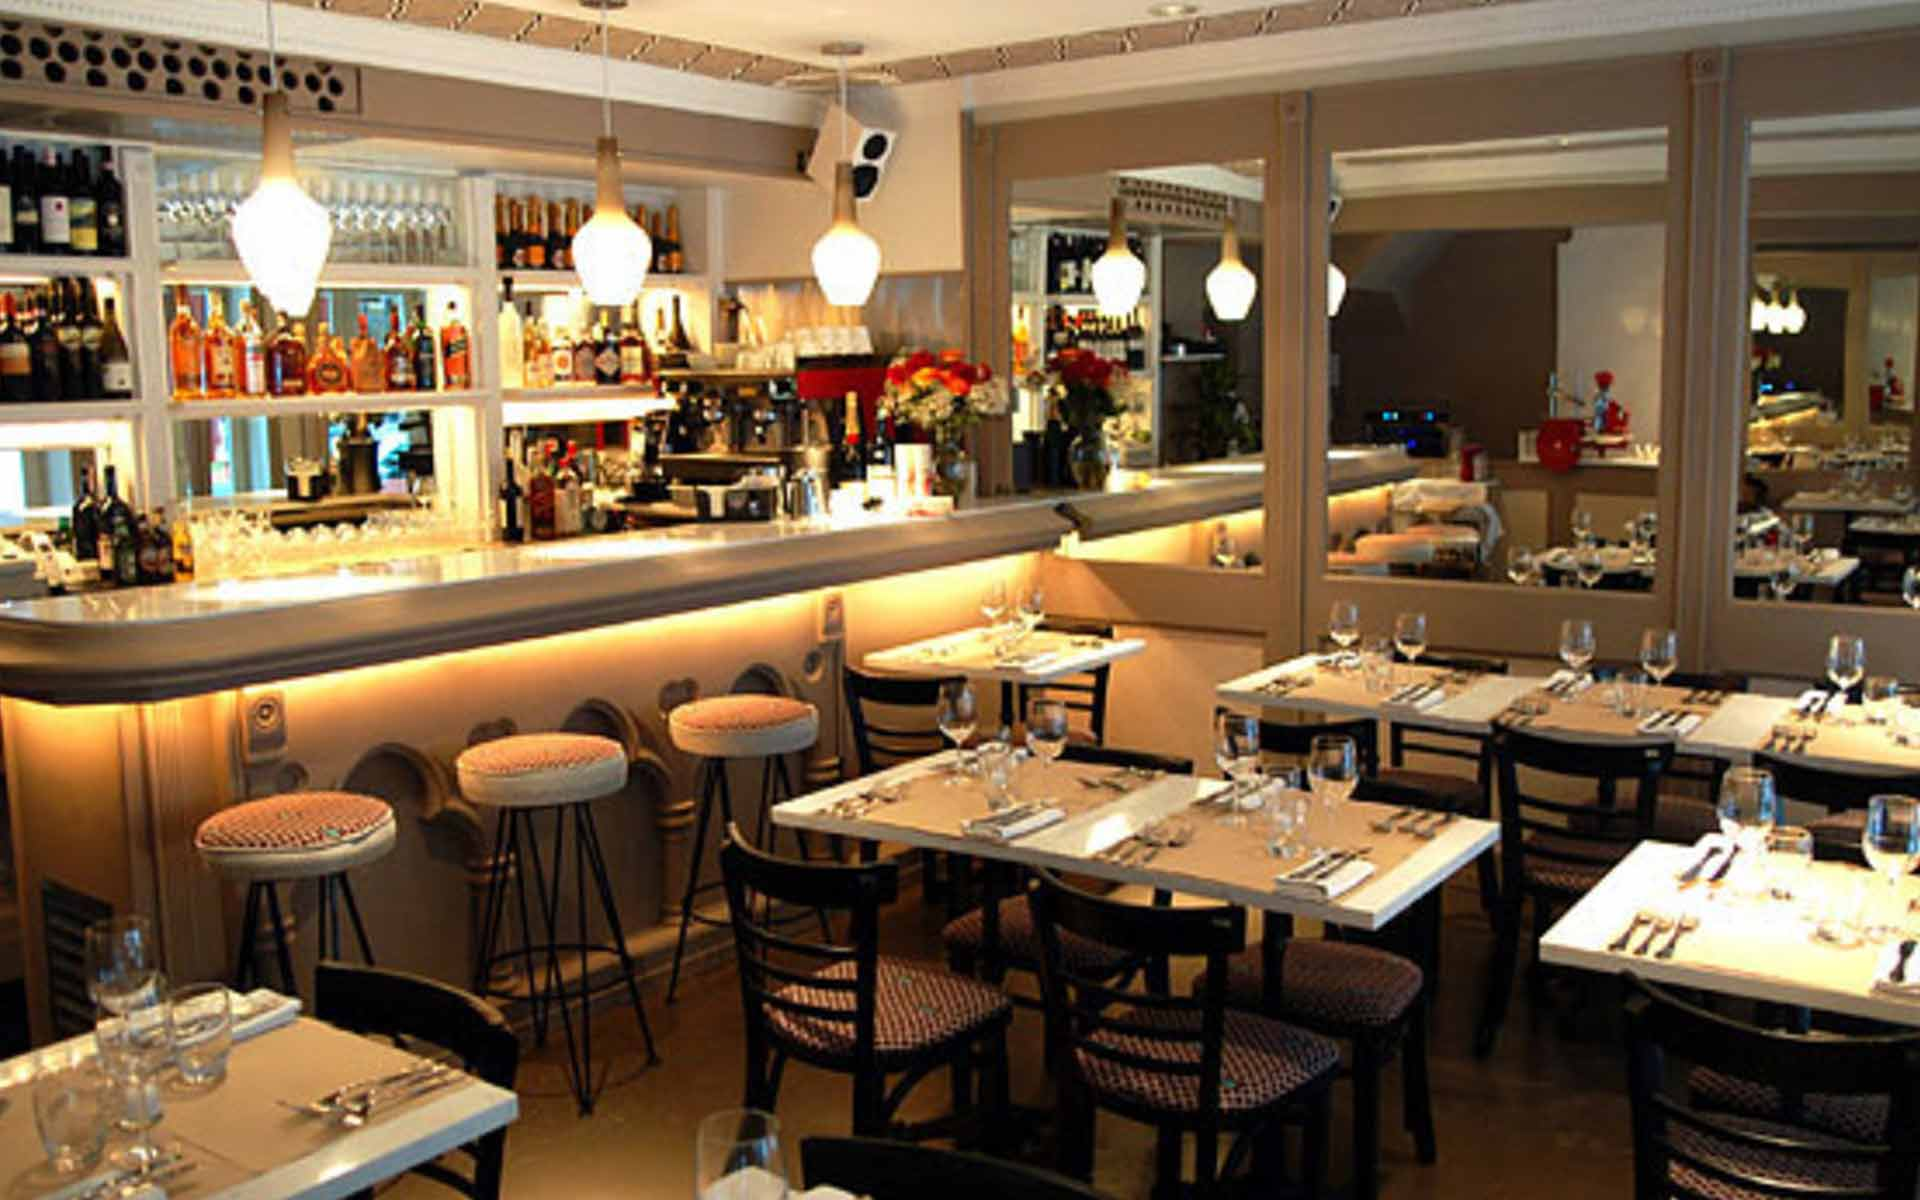 Piccola Cucina Osteria Siciliana Restaurants near the new york Hilton Midtown